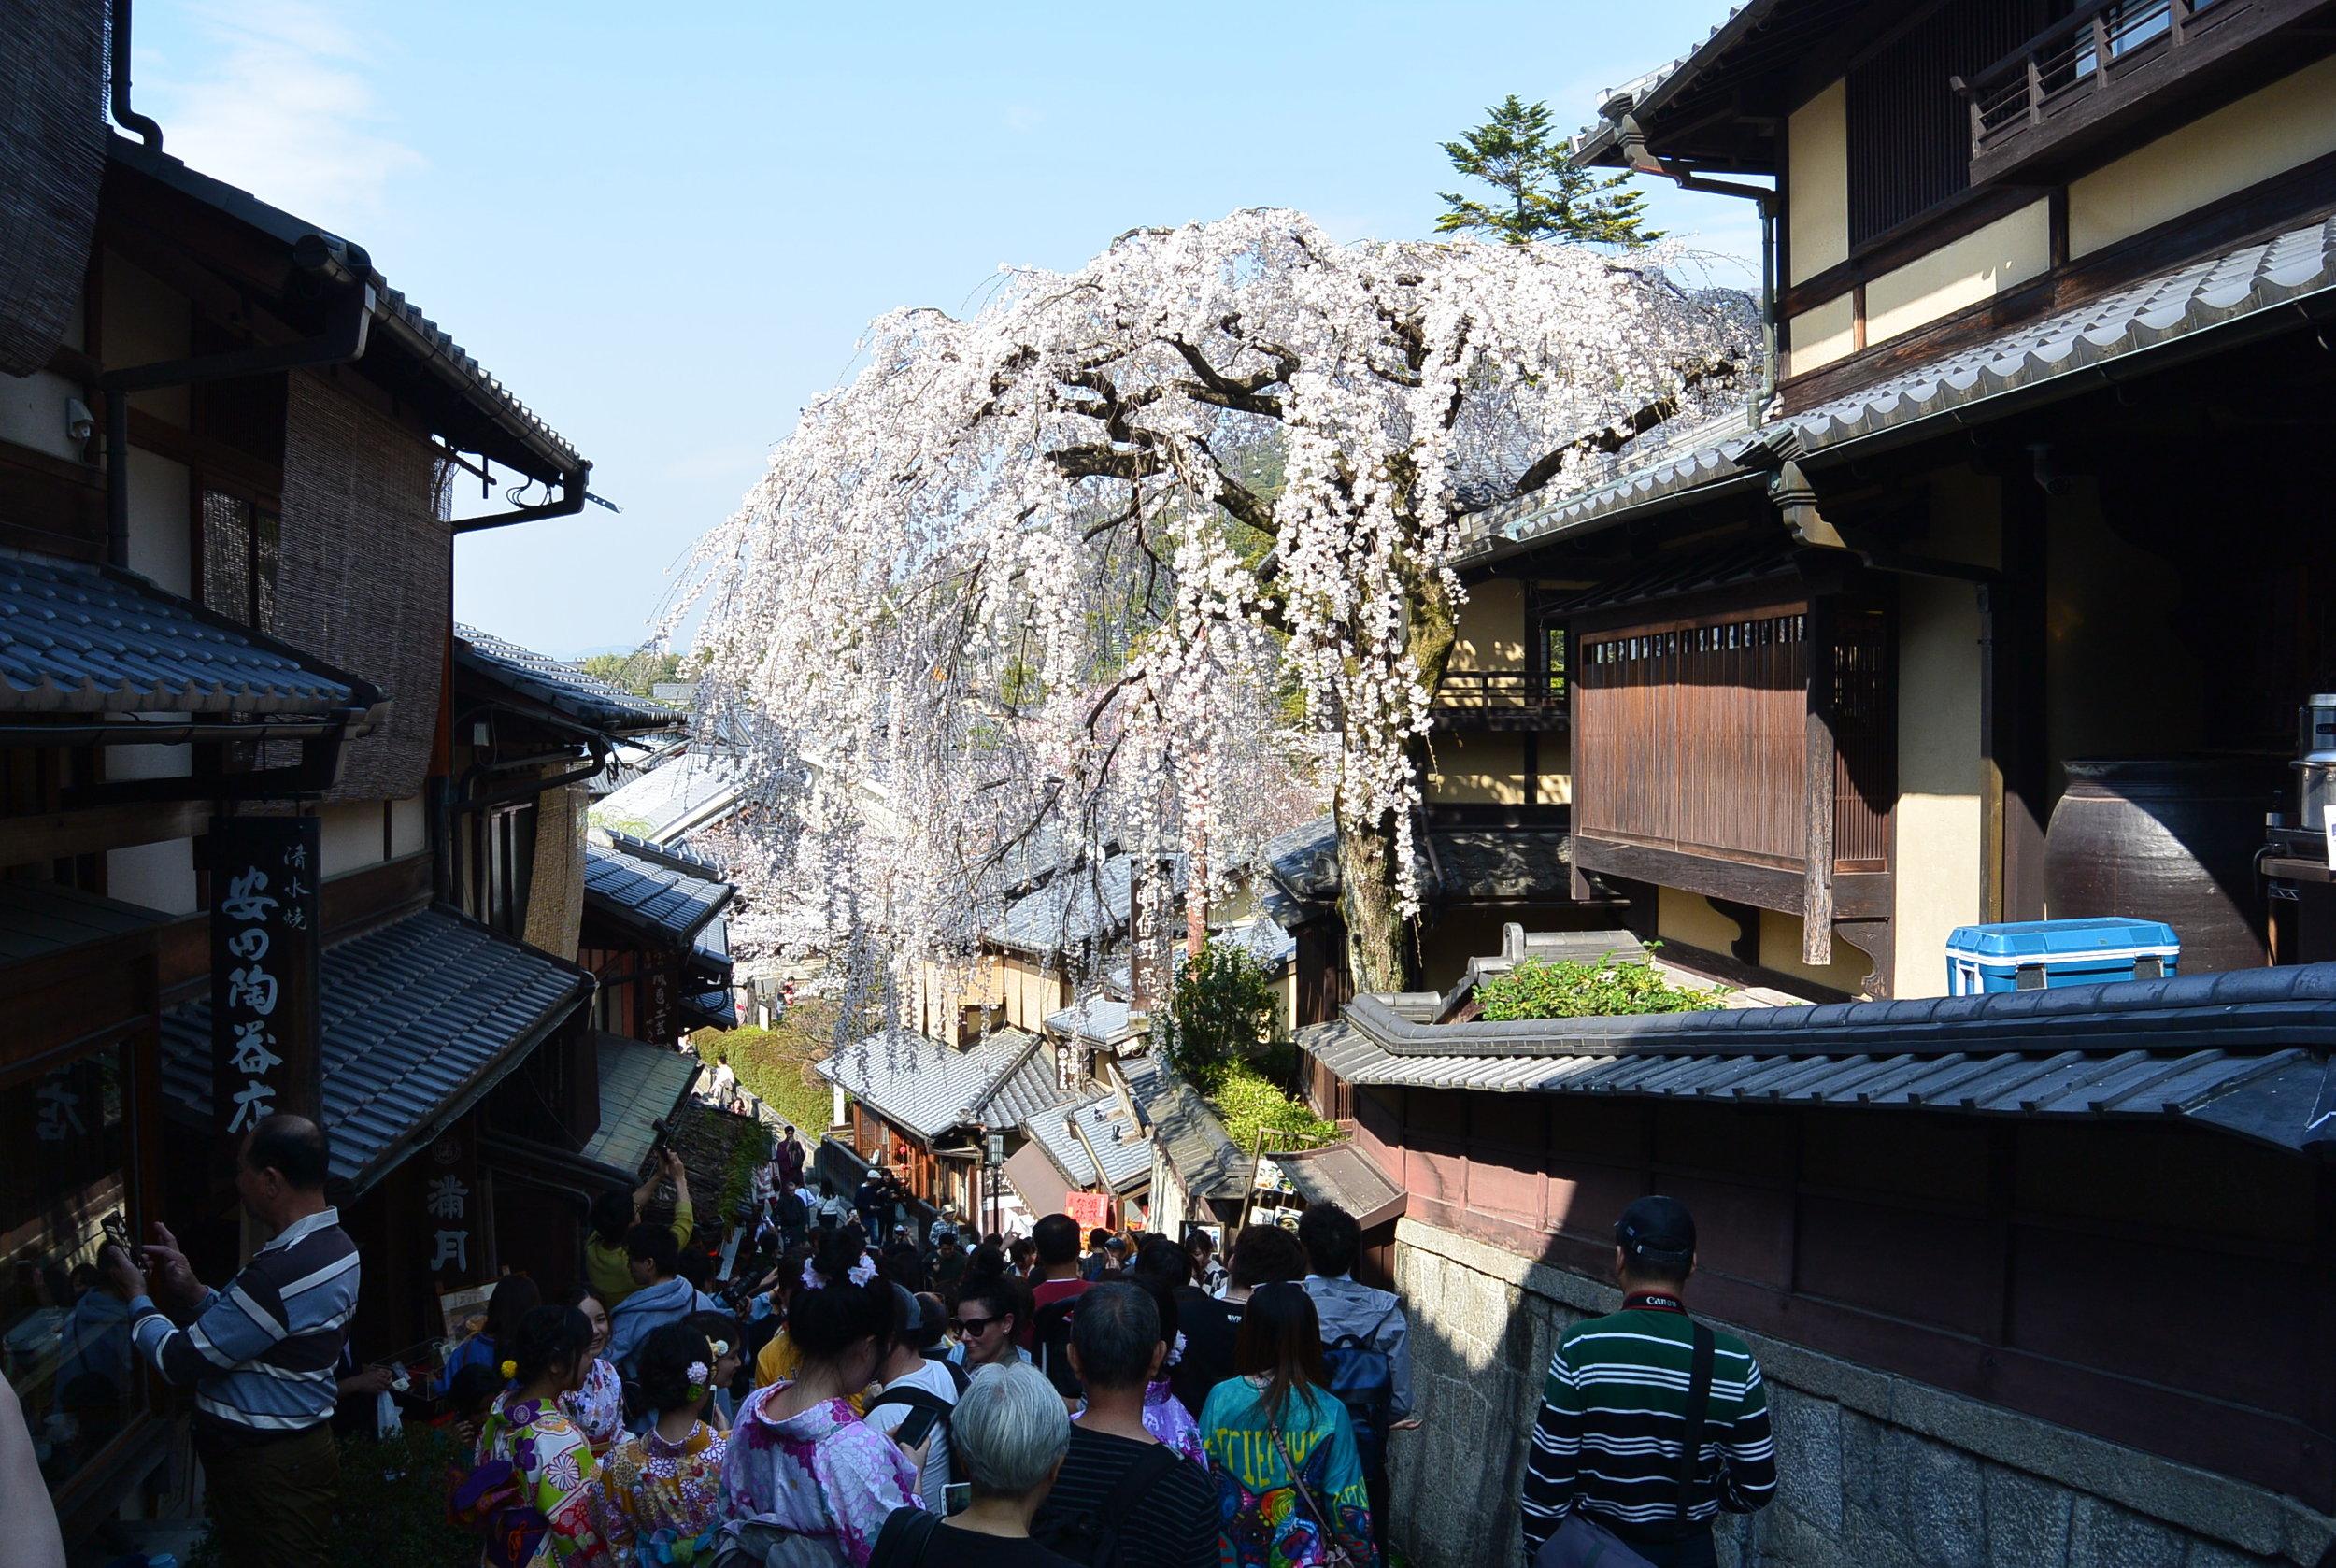 Day 4: Kyoto!